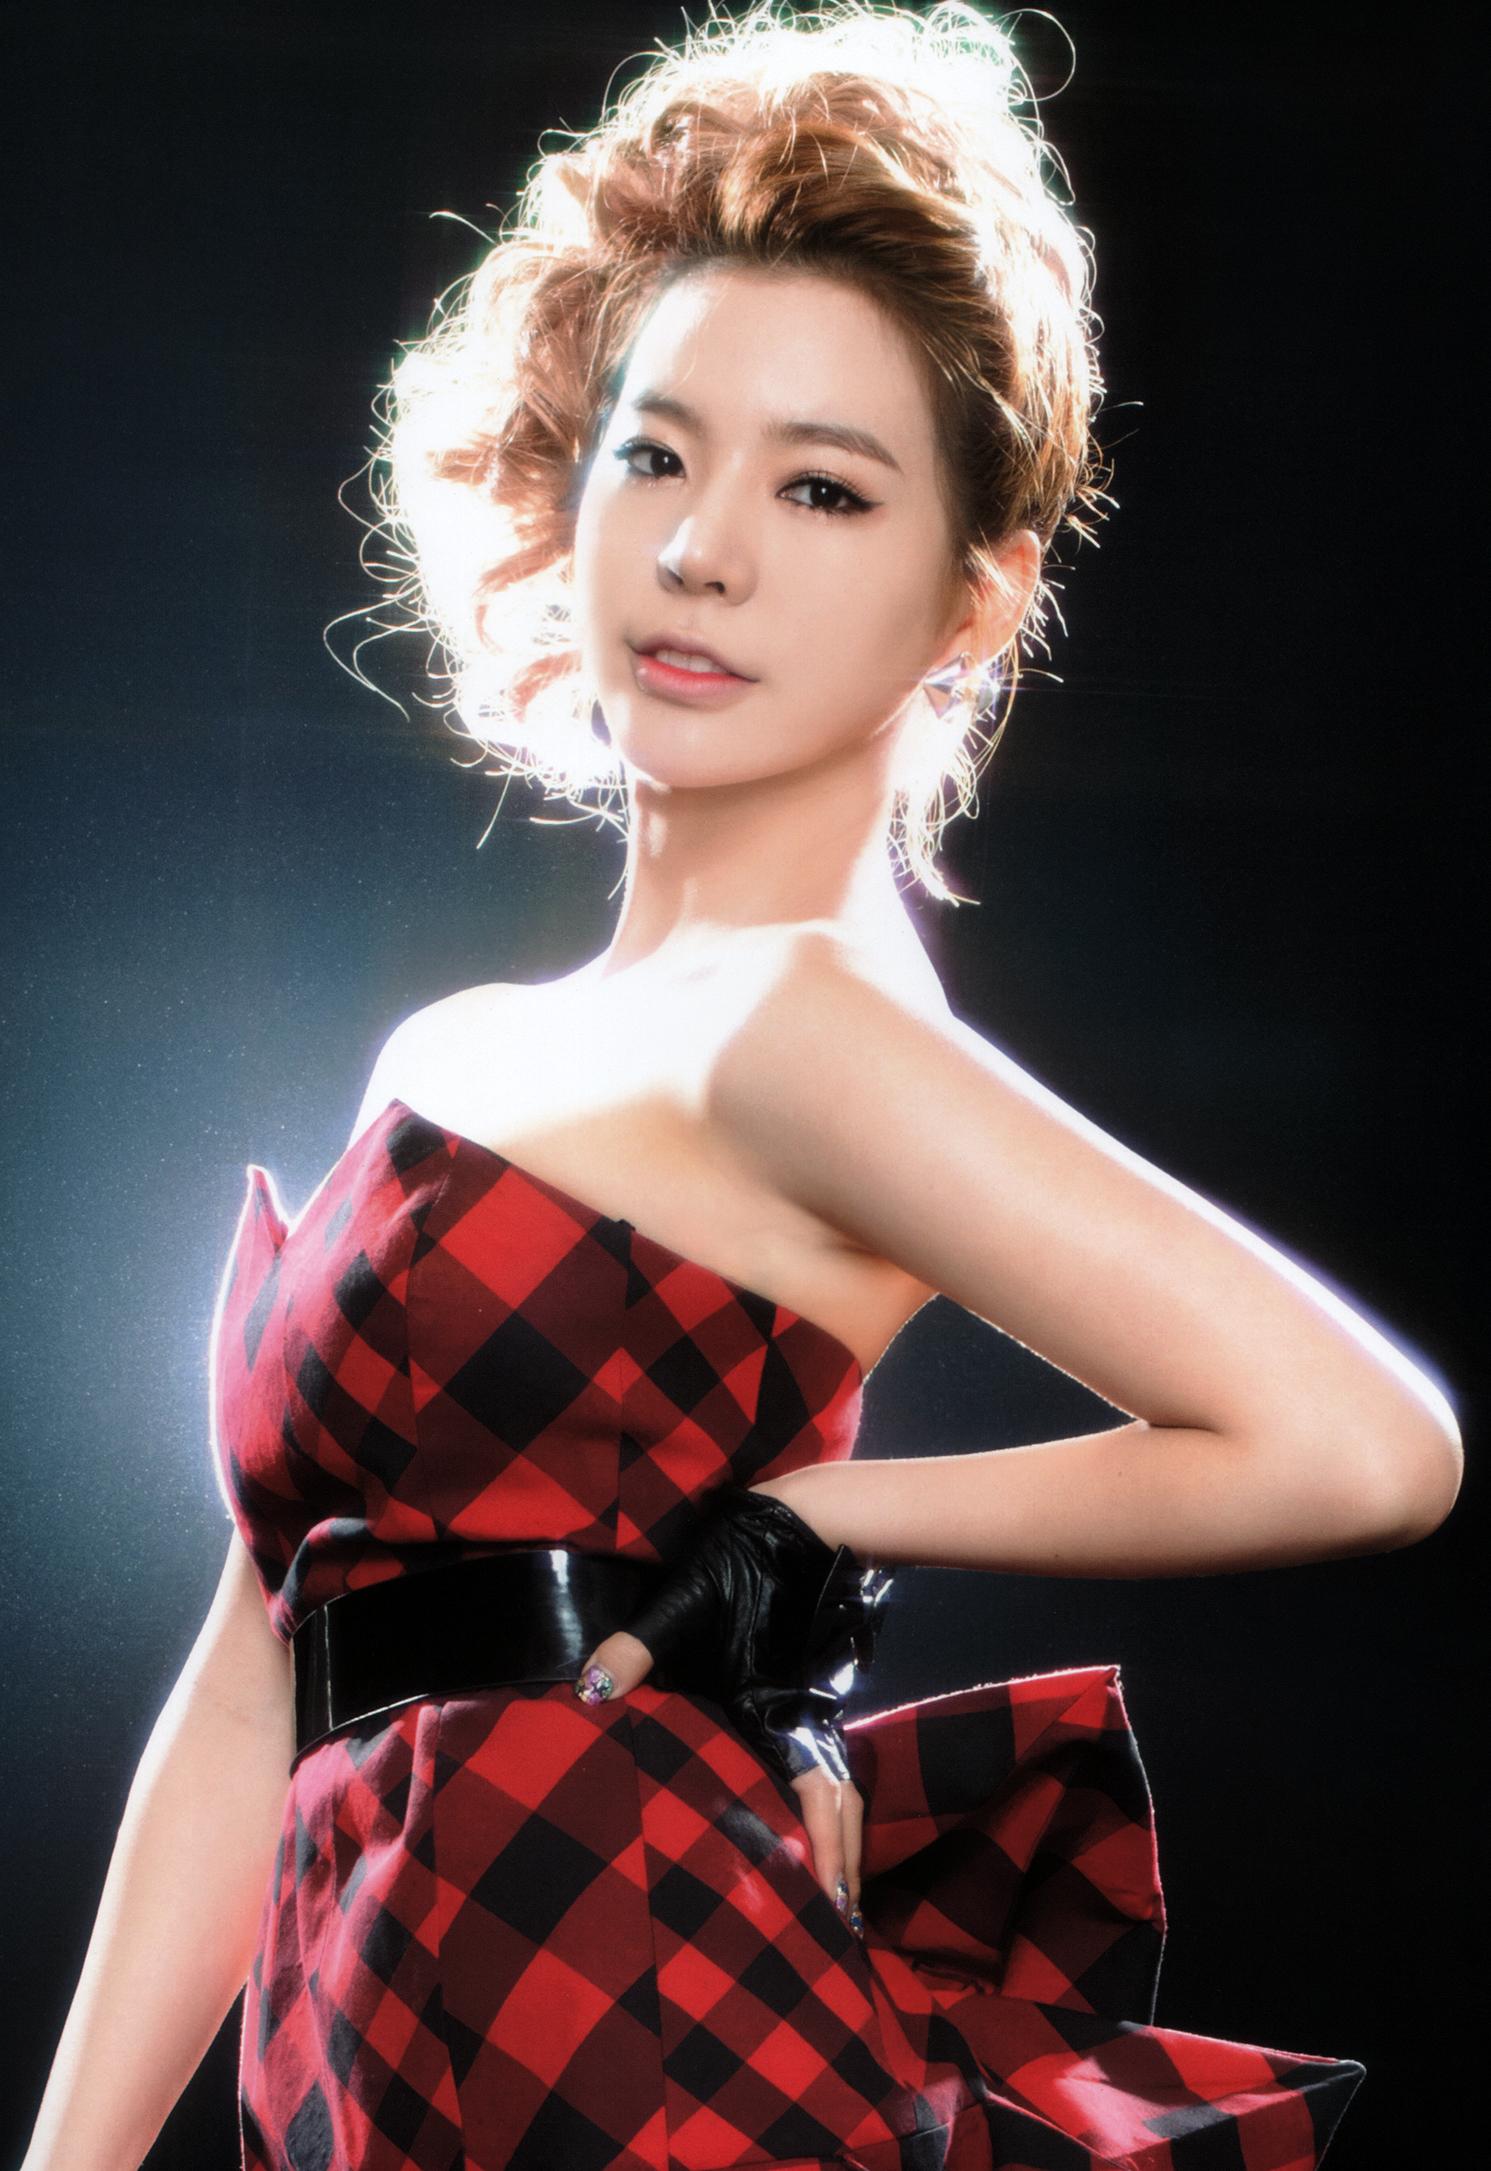 「♡」8 Años con Lee Soon Kyu (Sunny)「♡」 Snsd-2011-sunny